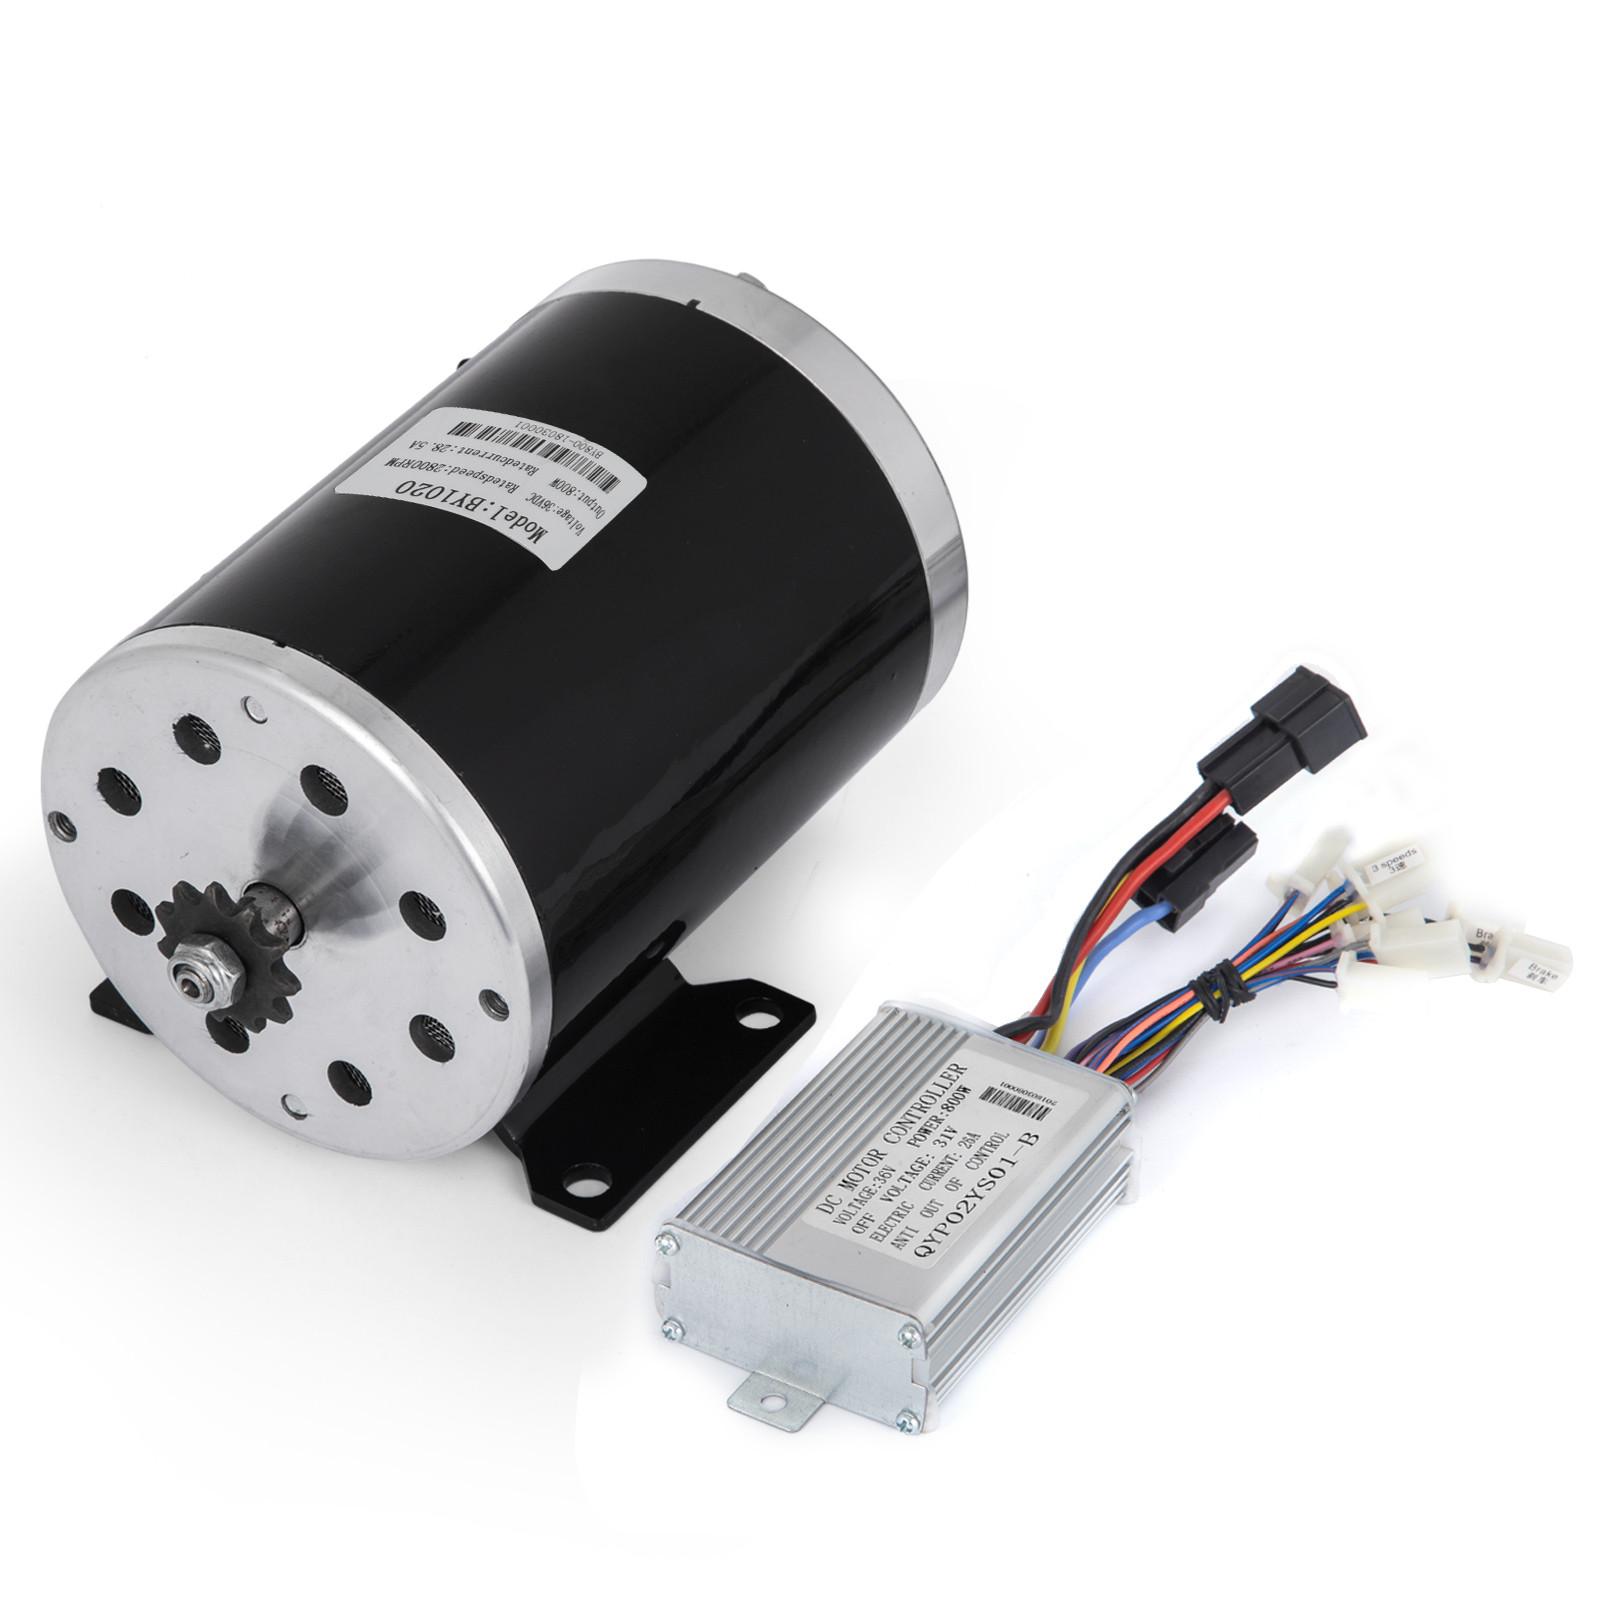 36v-Electric-Motor-controller-throttle-kit-f-Scooter-E-Scooter-ATV-Permanent thumbnail 88